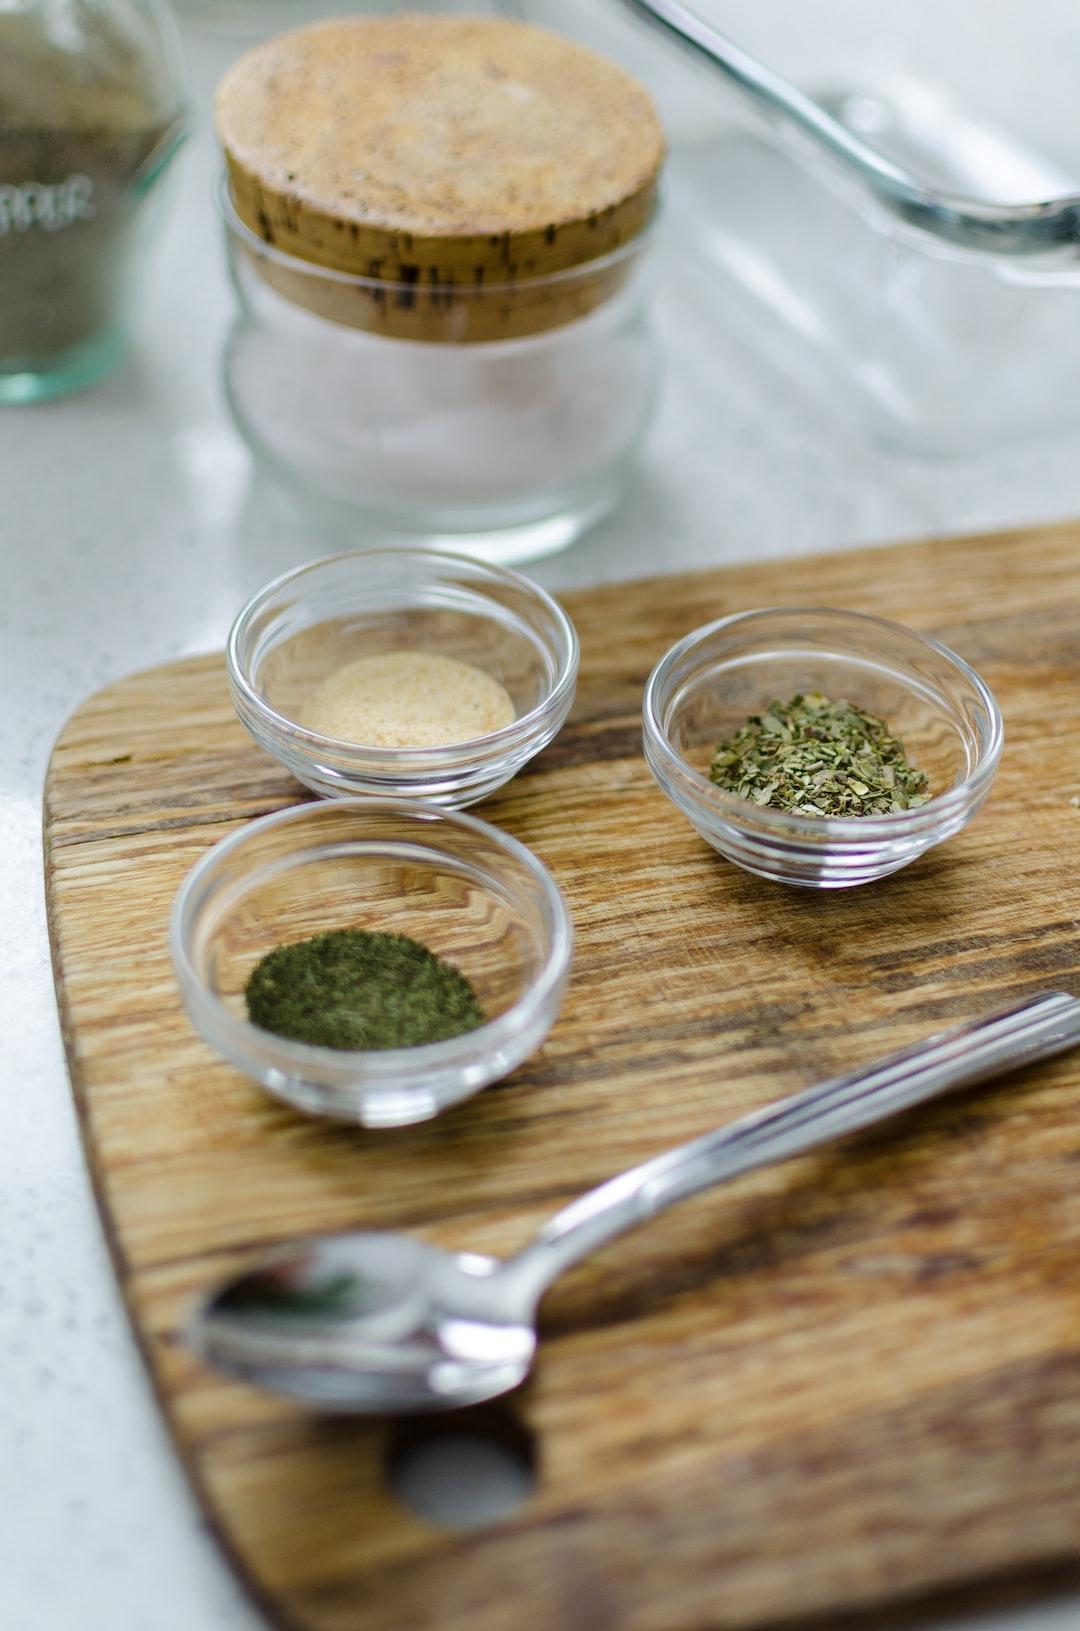 Food photography of herbs and seasonings